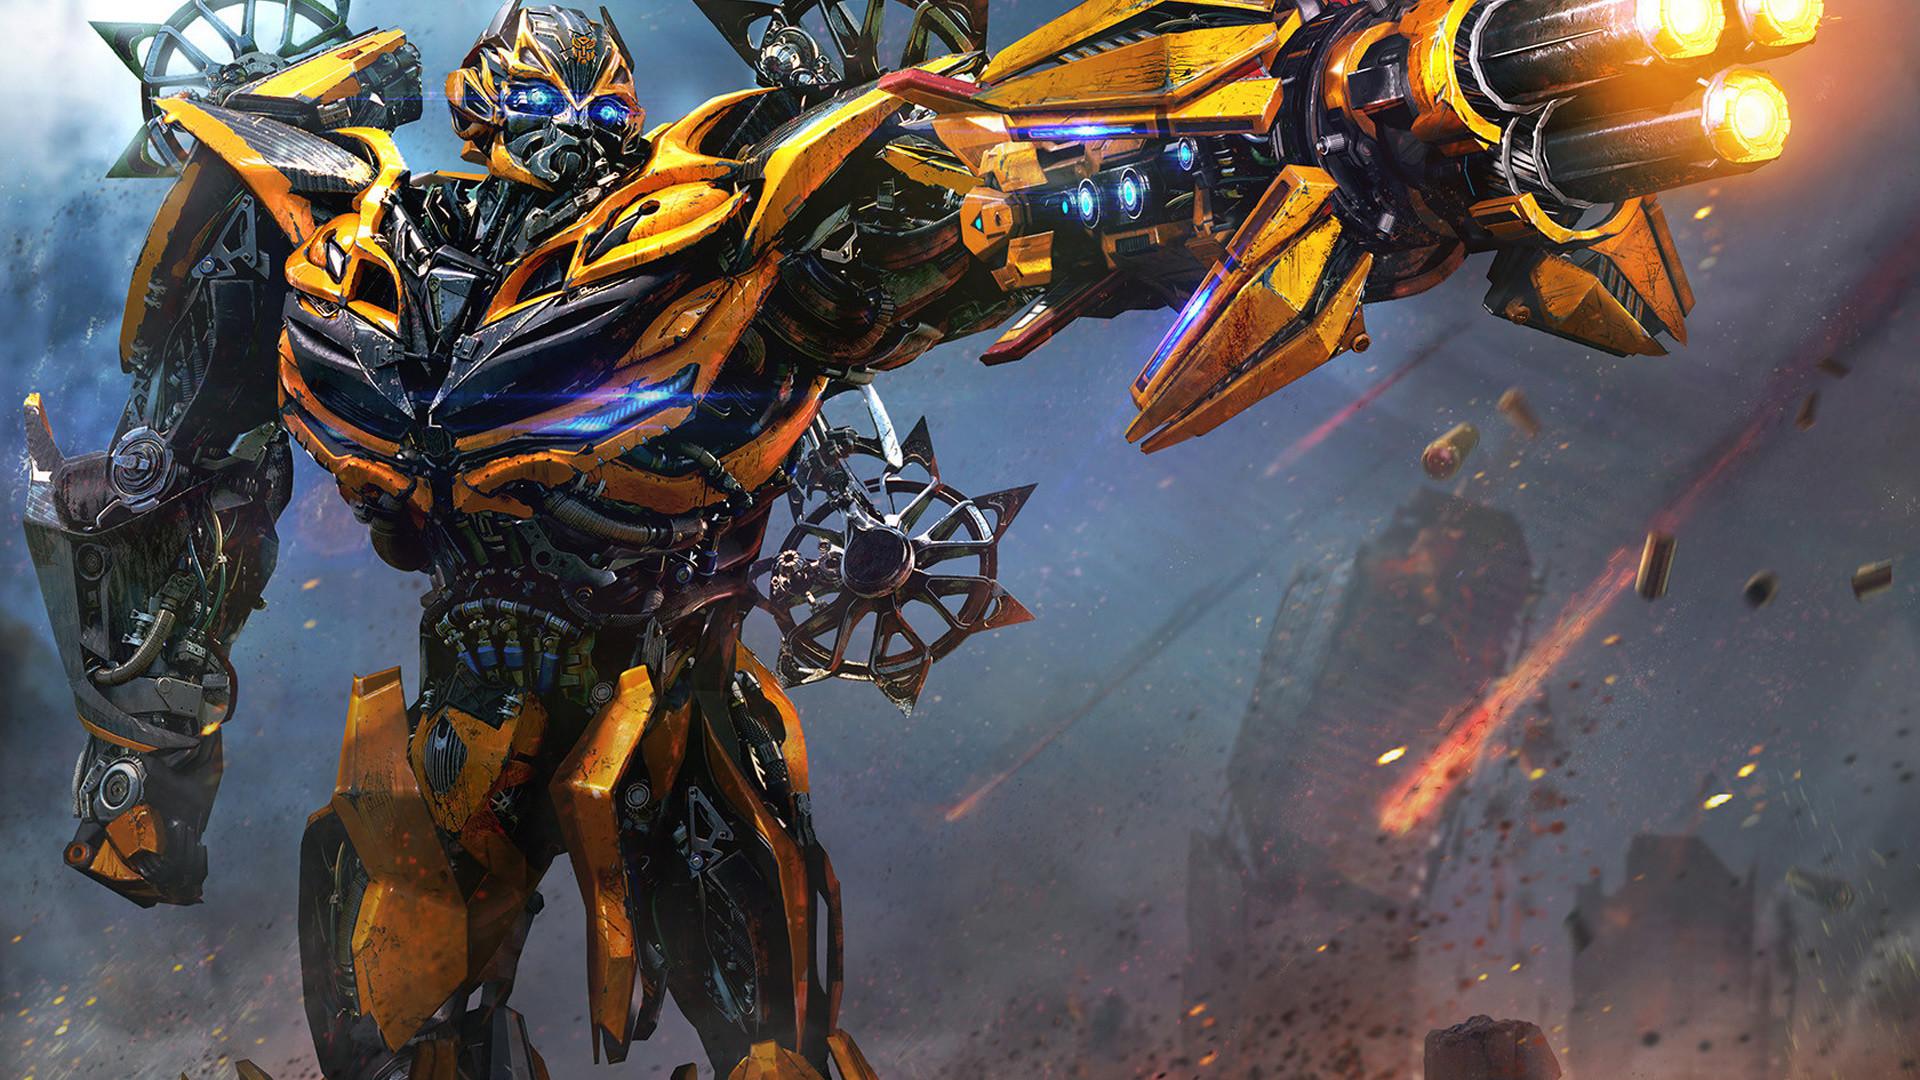 Res: 1920x1080, transformers-bumblebee-fj.jpg